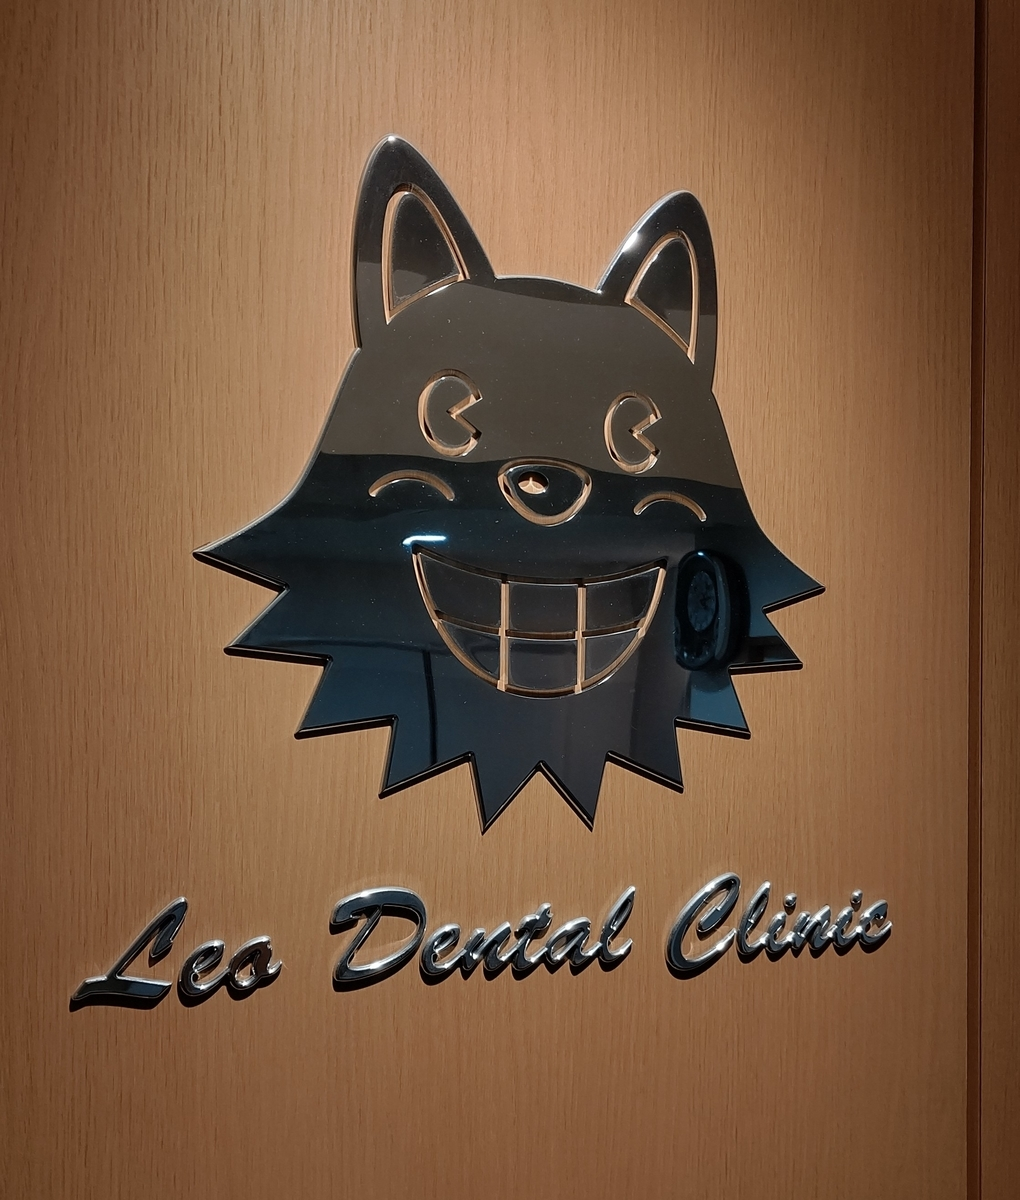 f:id:leo-dental-c:20201201200201j:plain